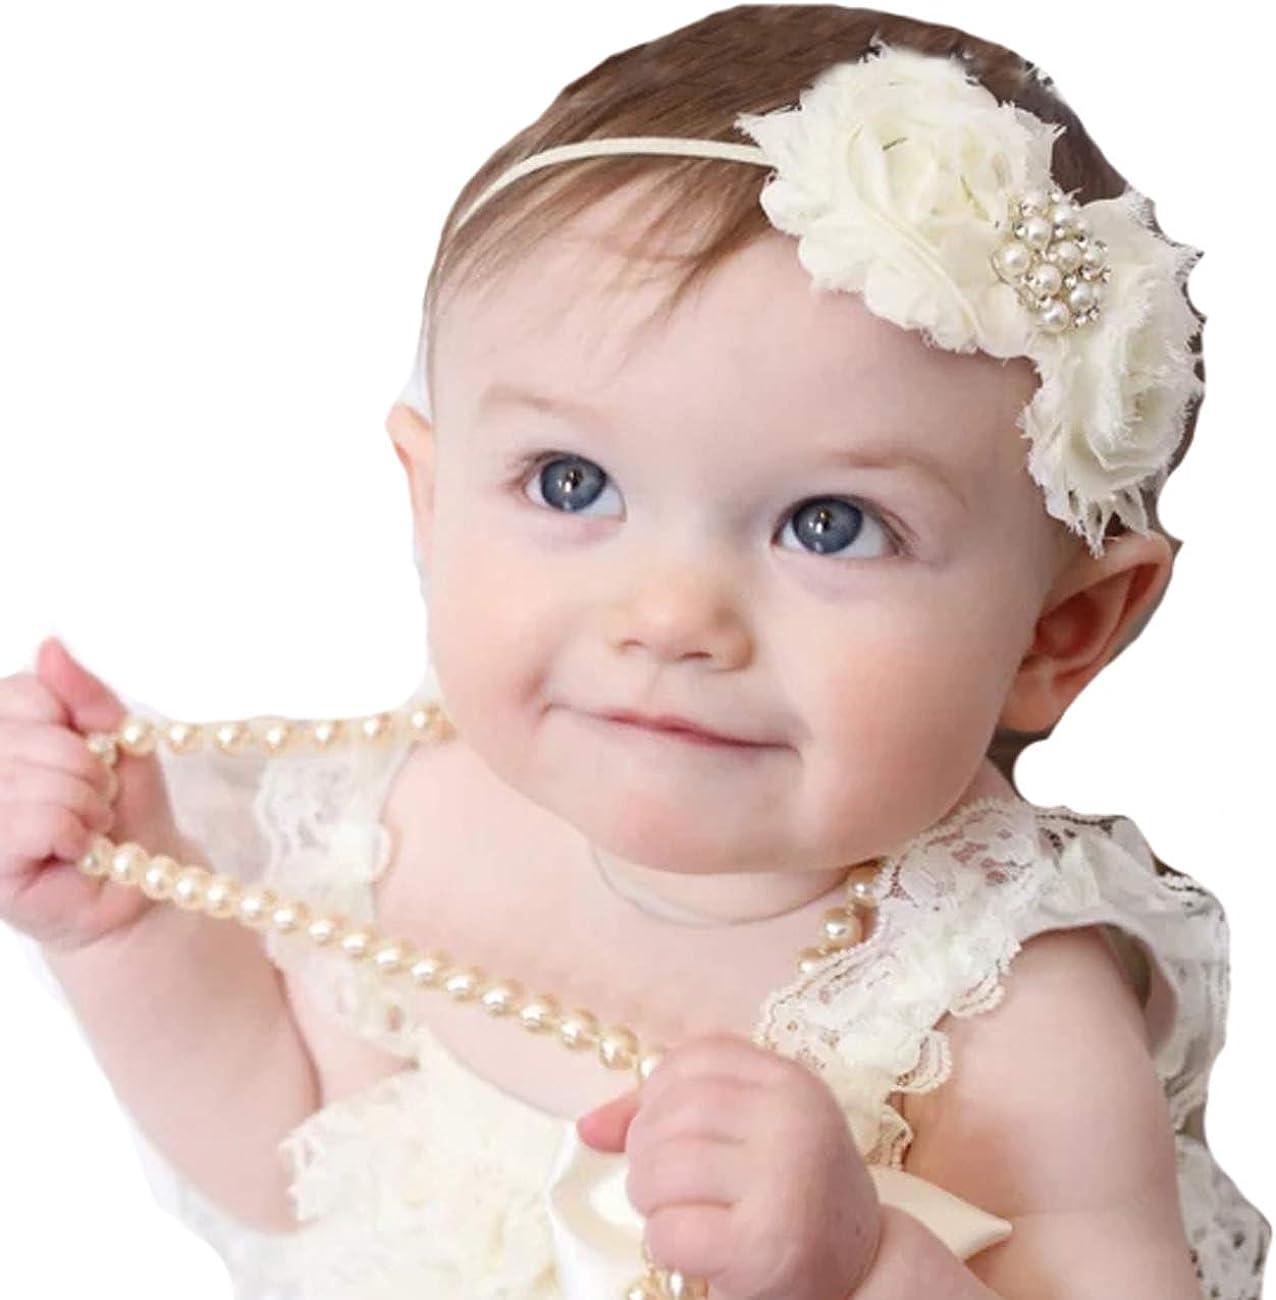 Newborn Baby Headband Socks Set Cute Flower Pearls Bows Princess Girls Hair Band